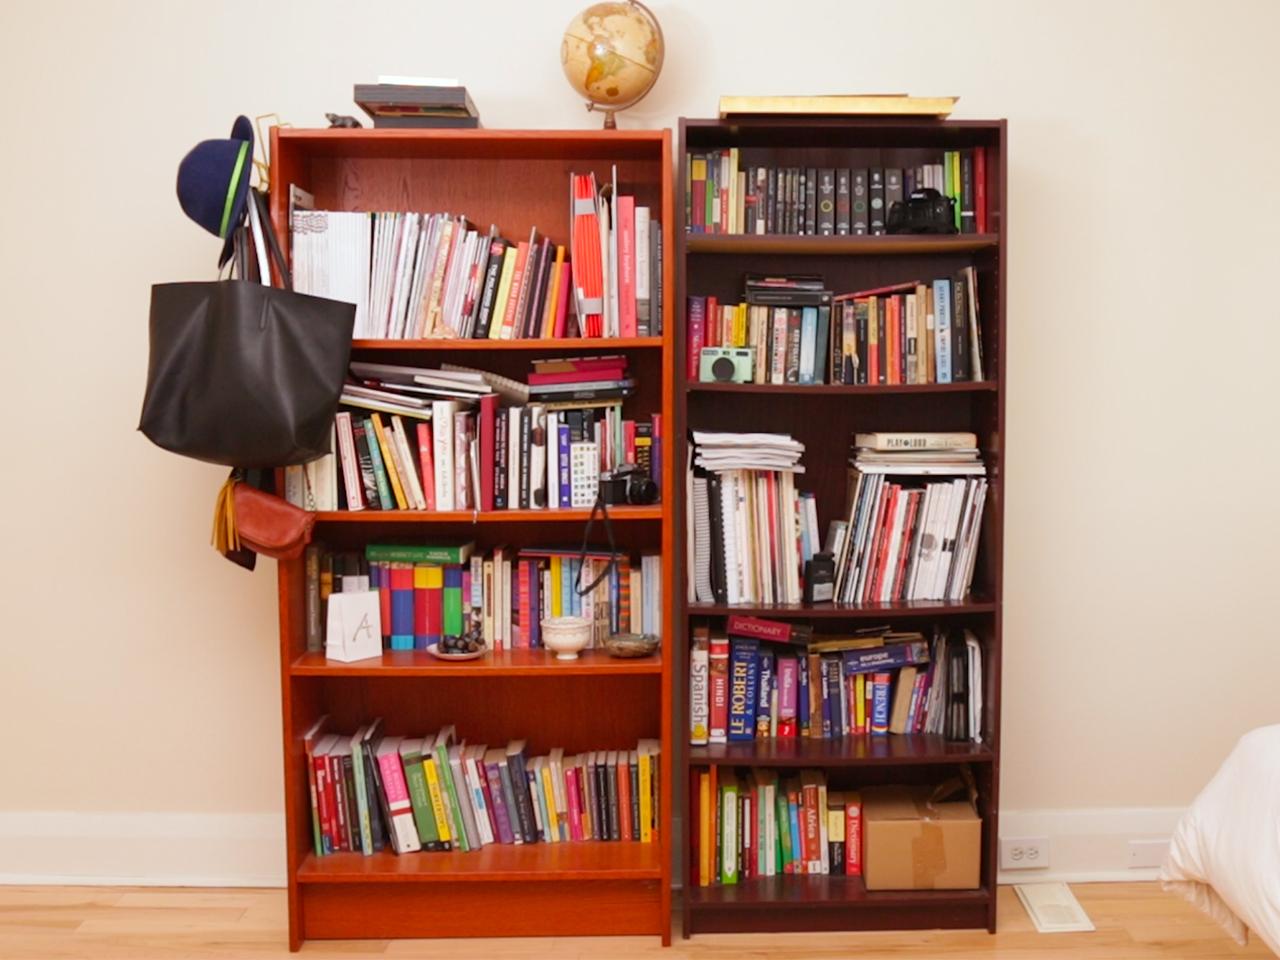 bookshelf bookshelves transform into inspired shelves mismatched masterpiece under books chatelaine falling